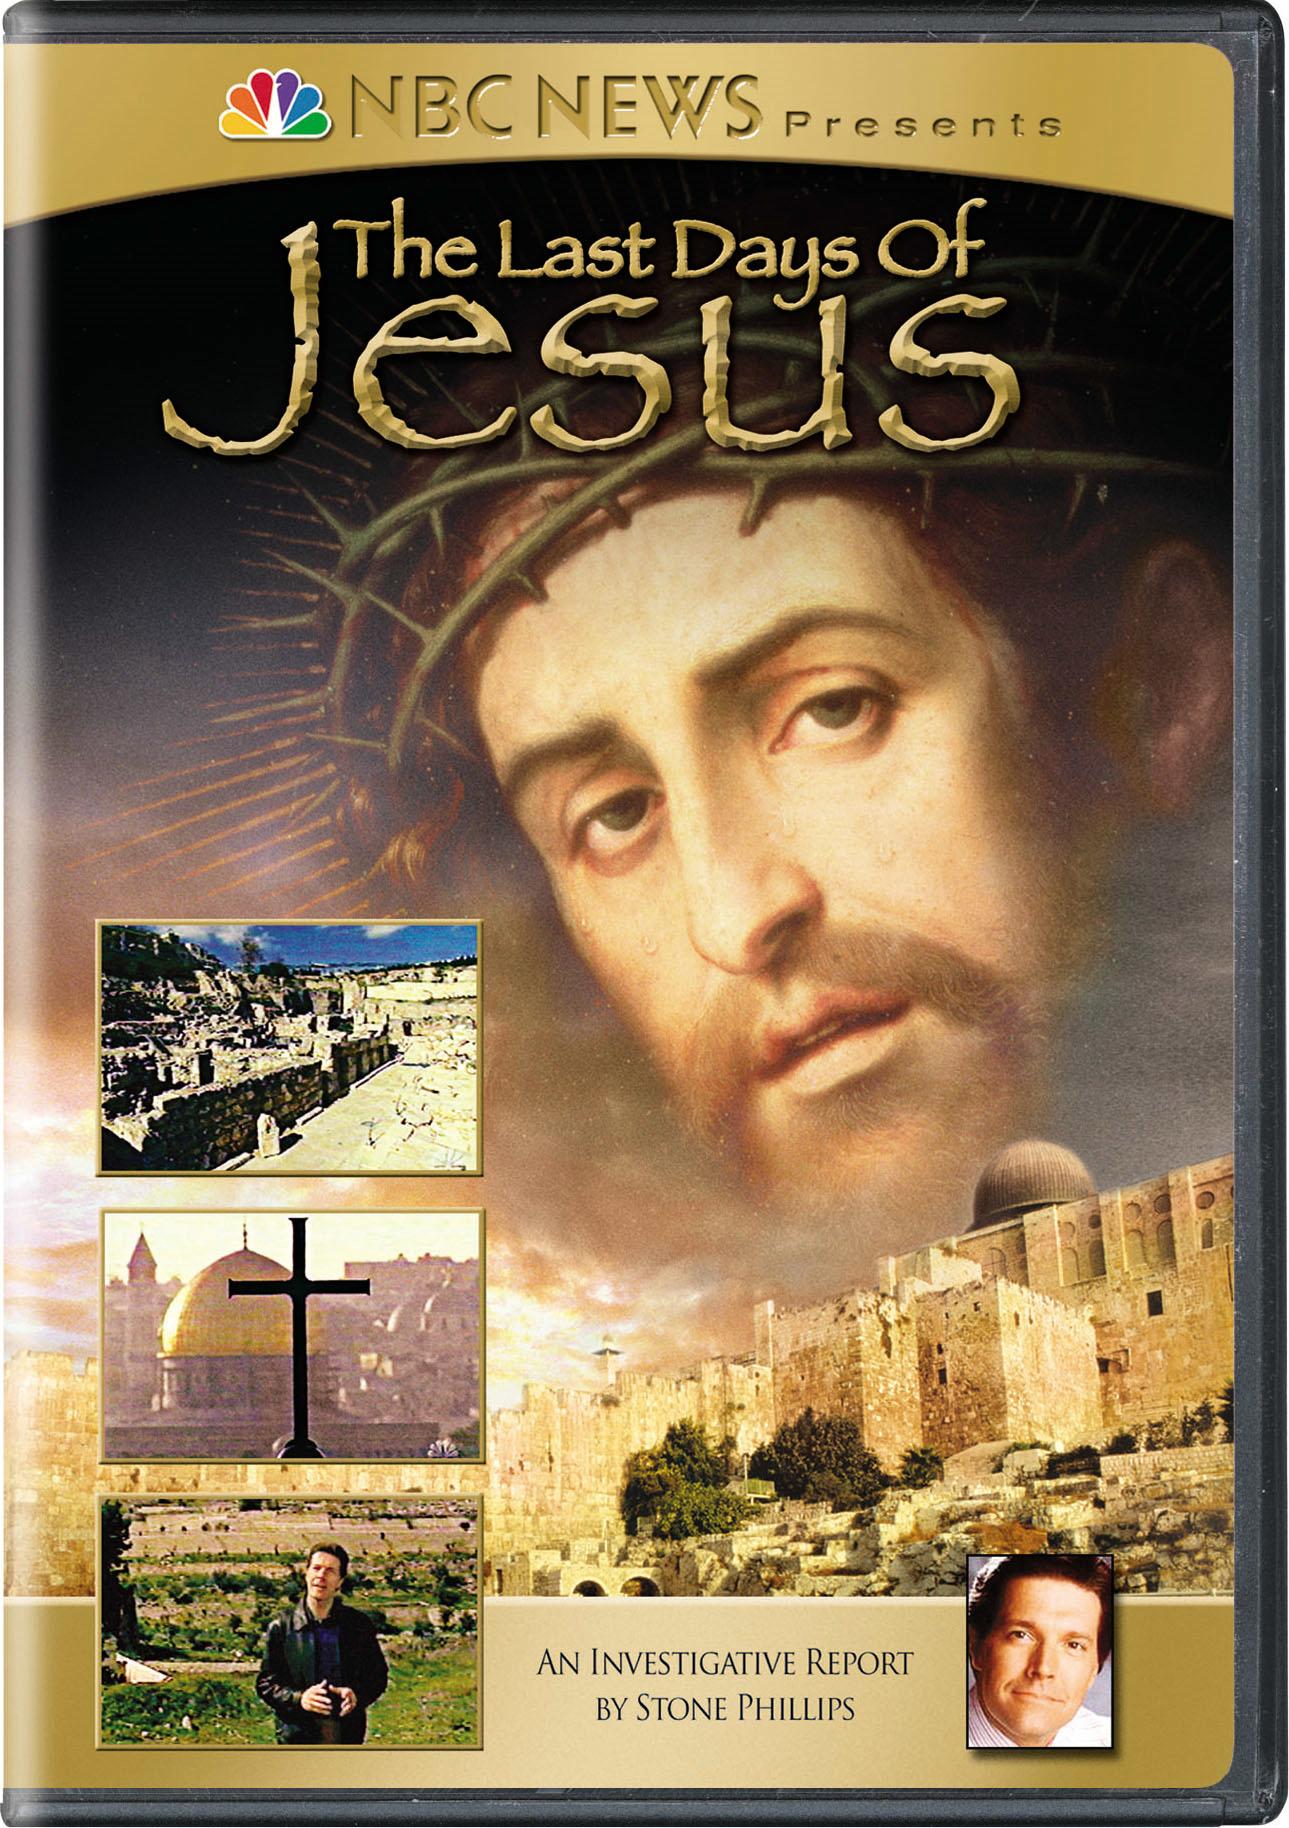 NBC News Presents: The Last Days of Jesus [DVD]